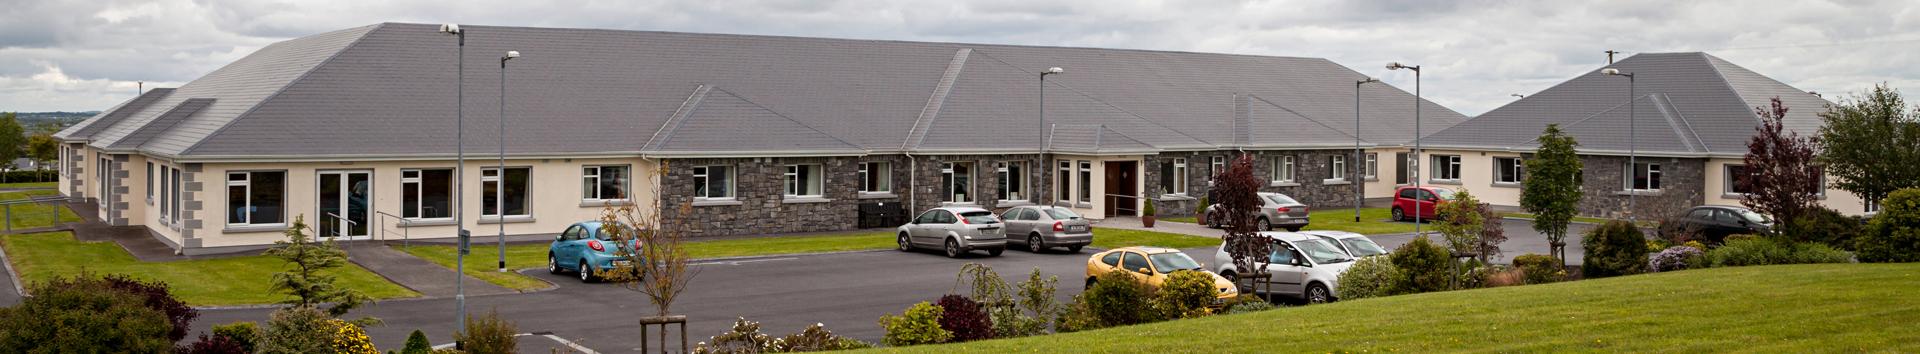 Flannery's Nursing Homes Ireland